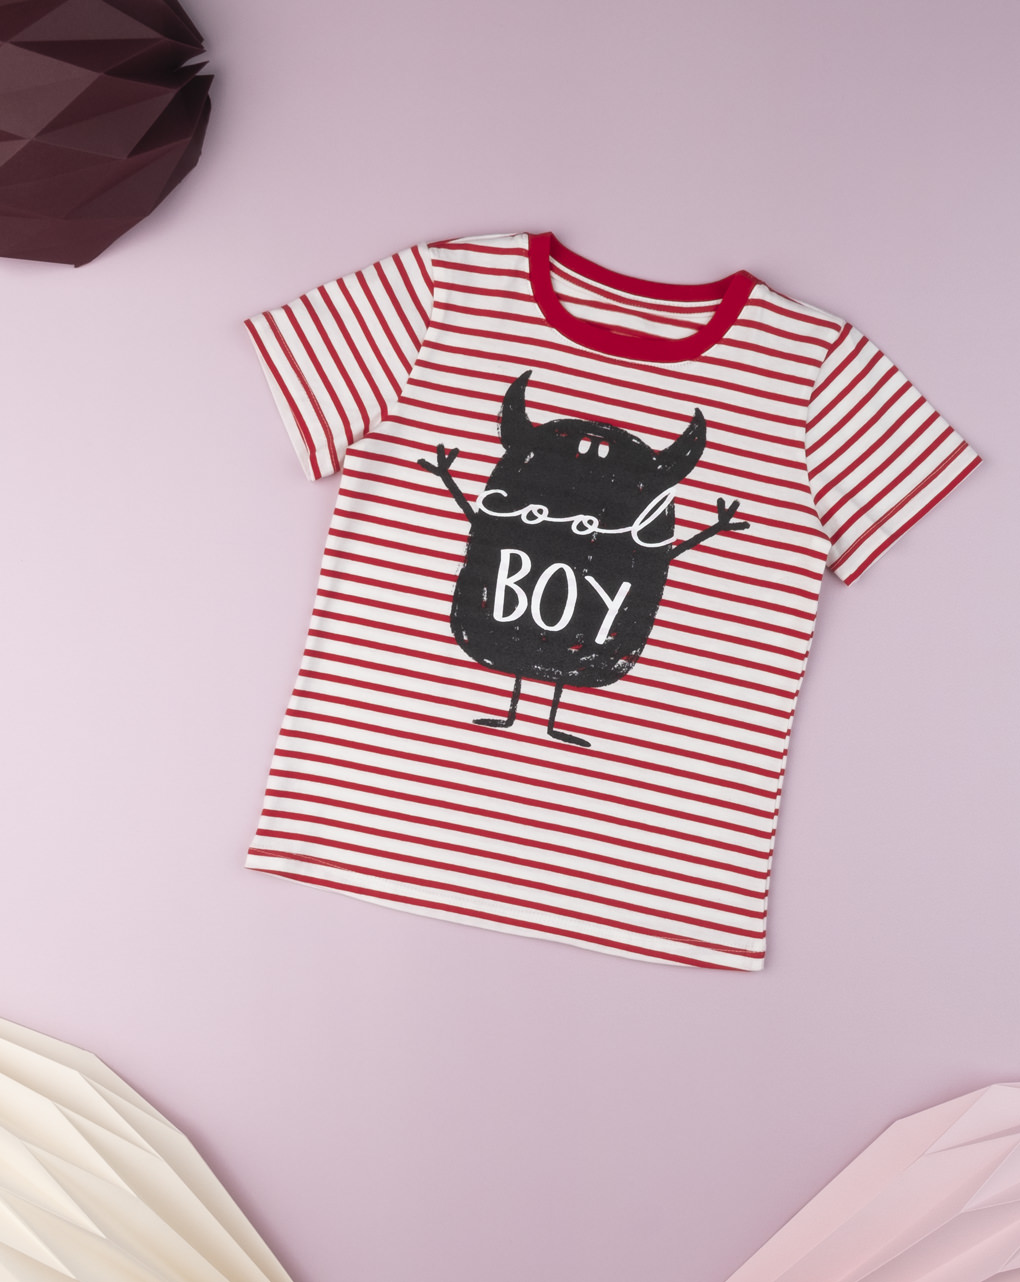 T-shirt Jersey Ριγέ για Αγόρι